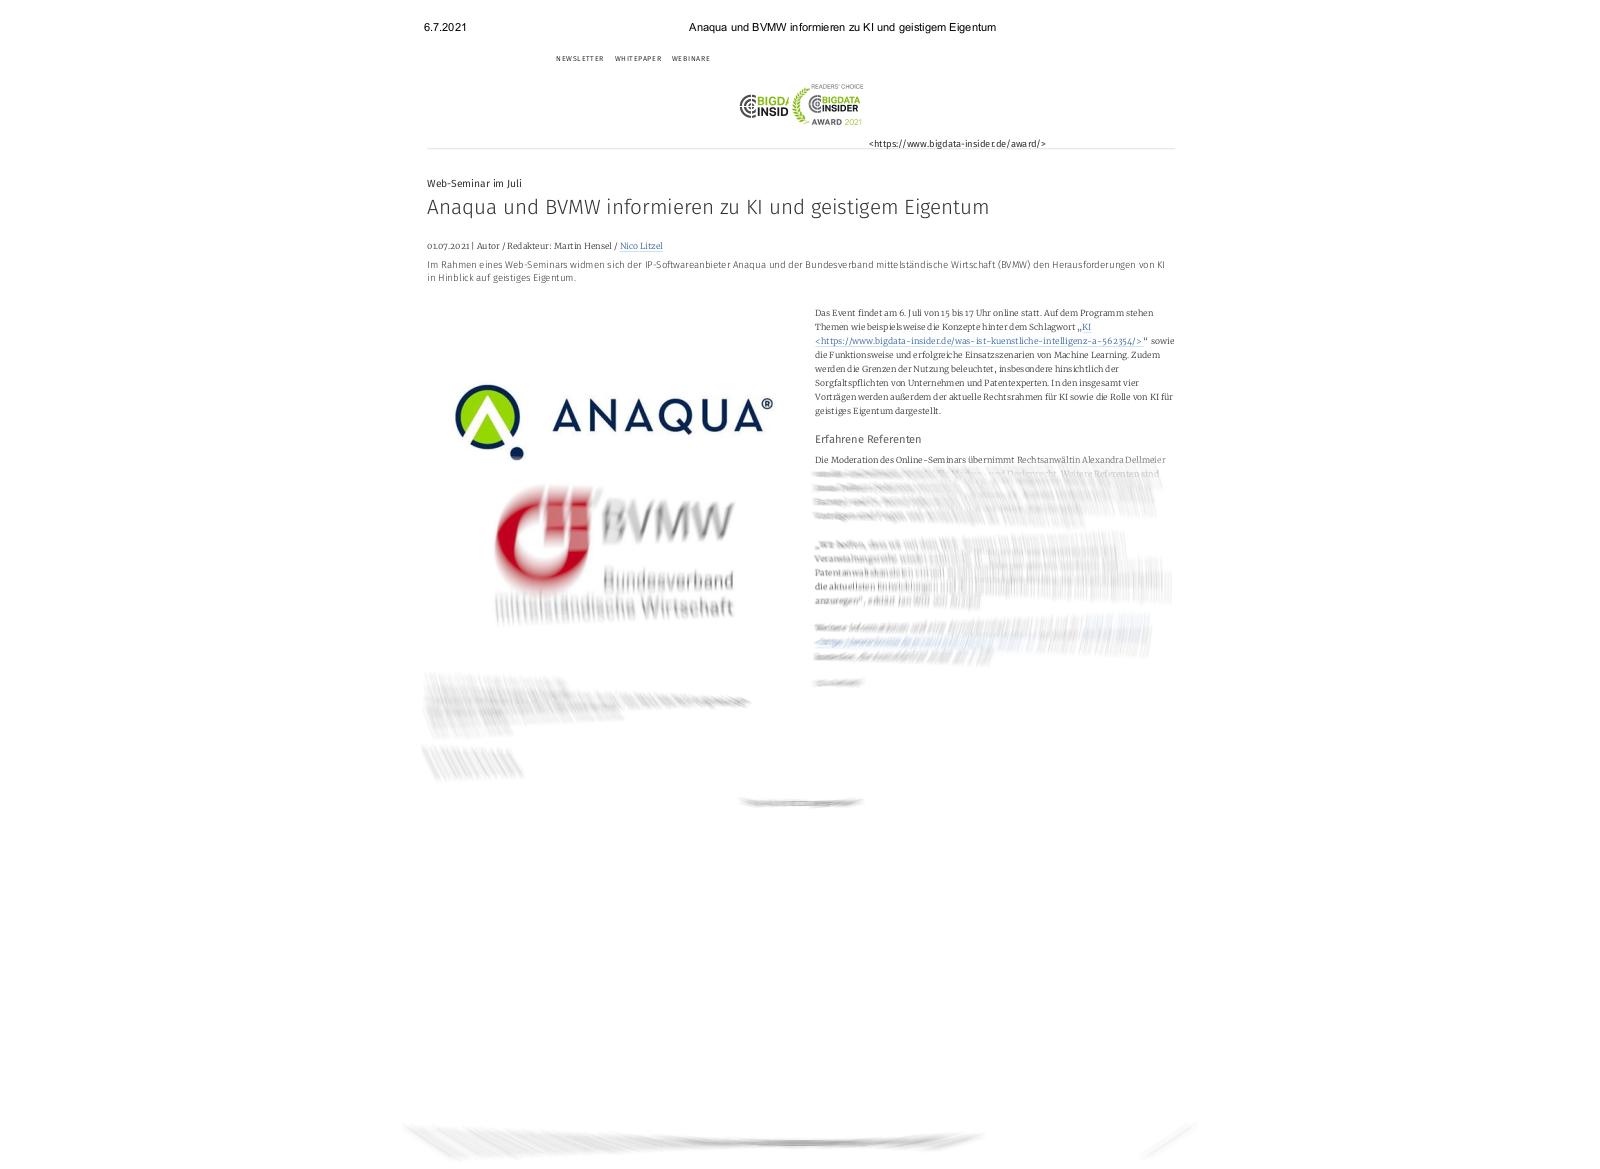 BigData-Insider Anaqua BVMW